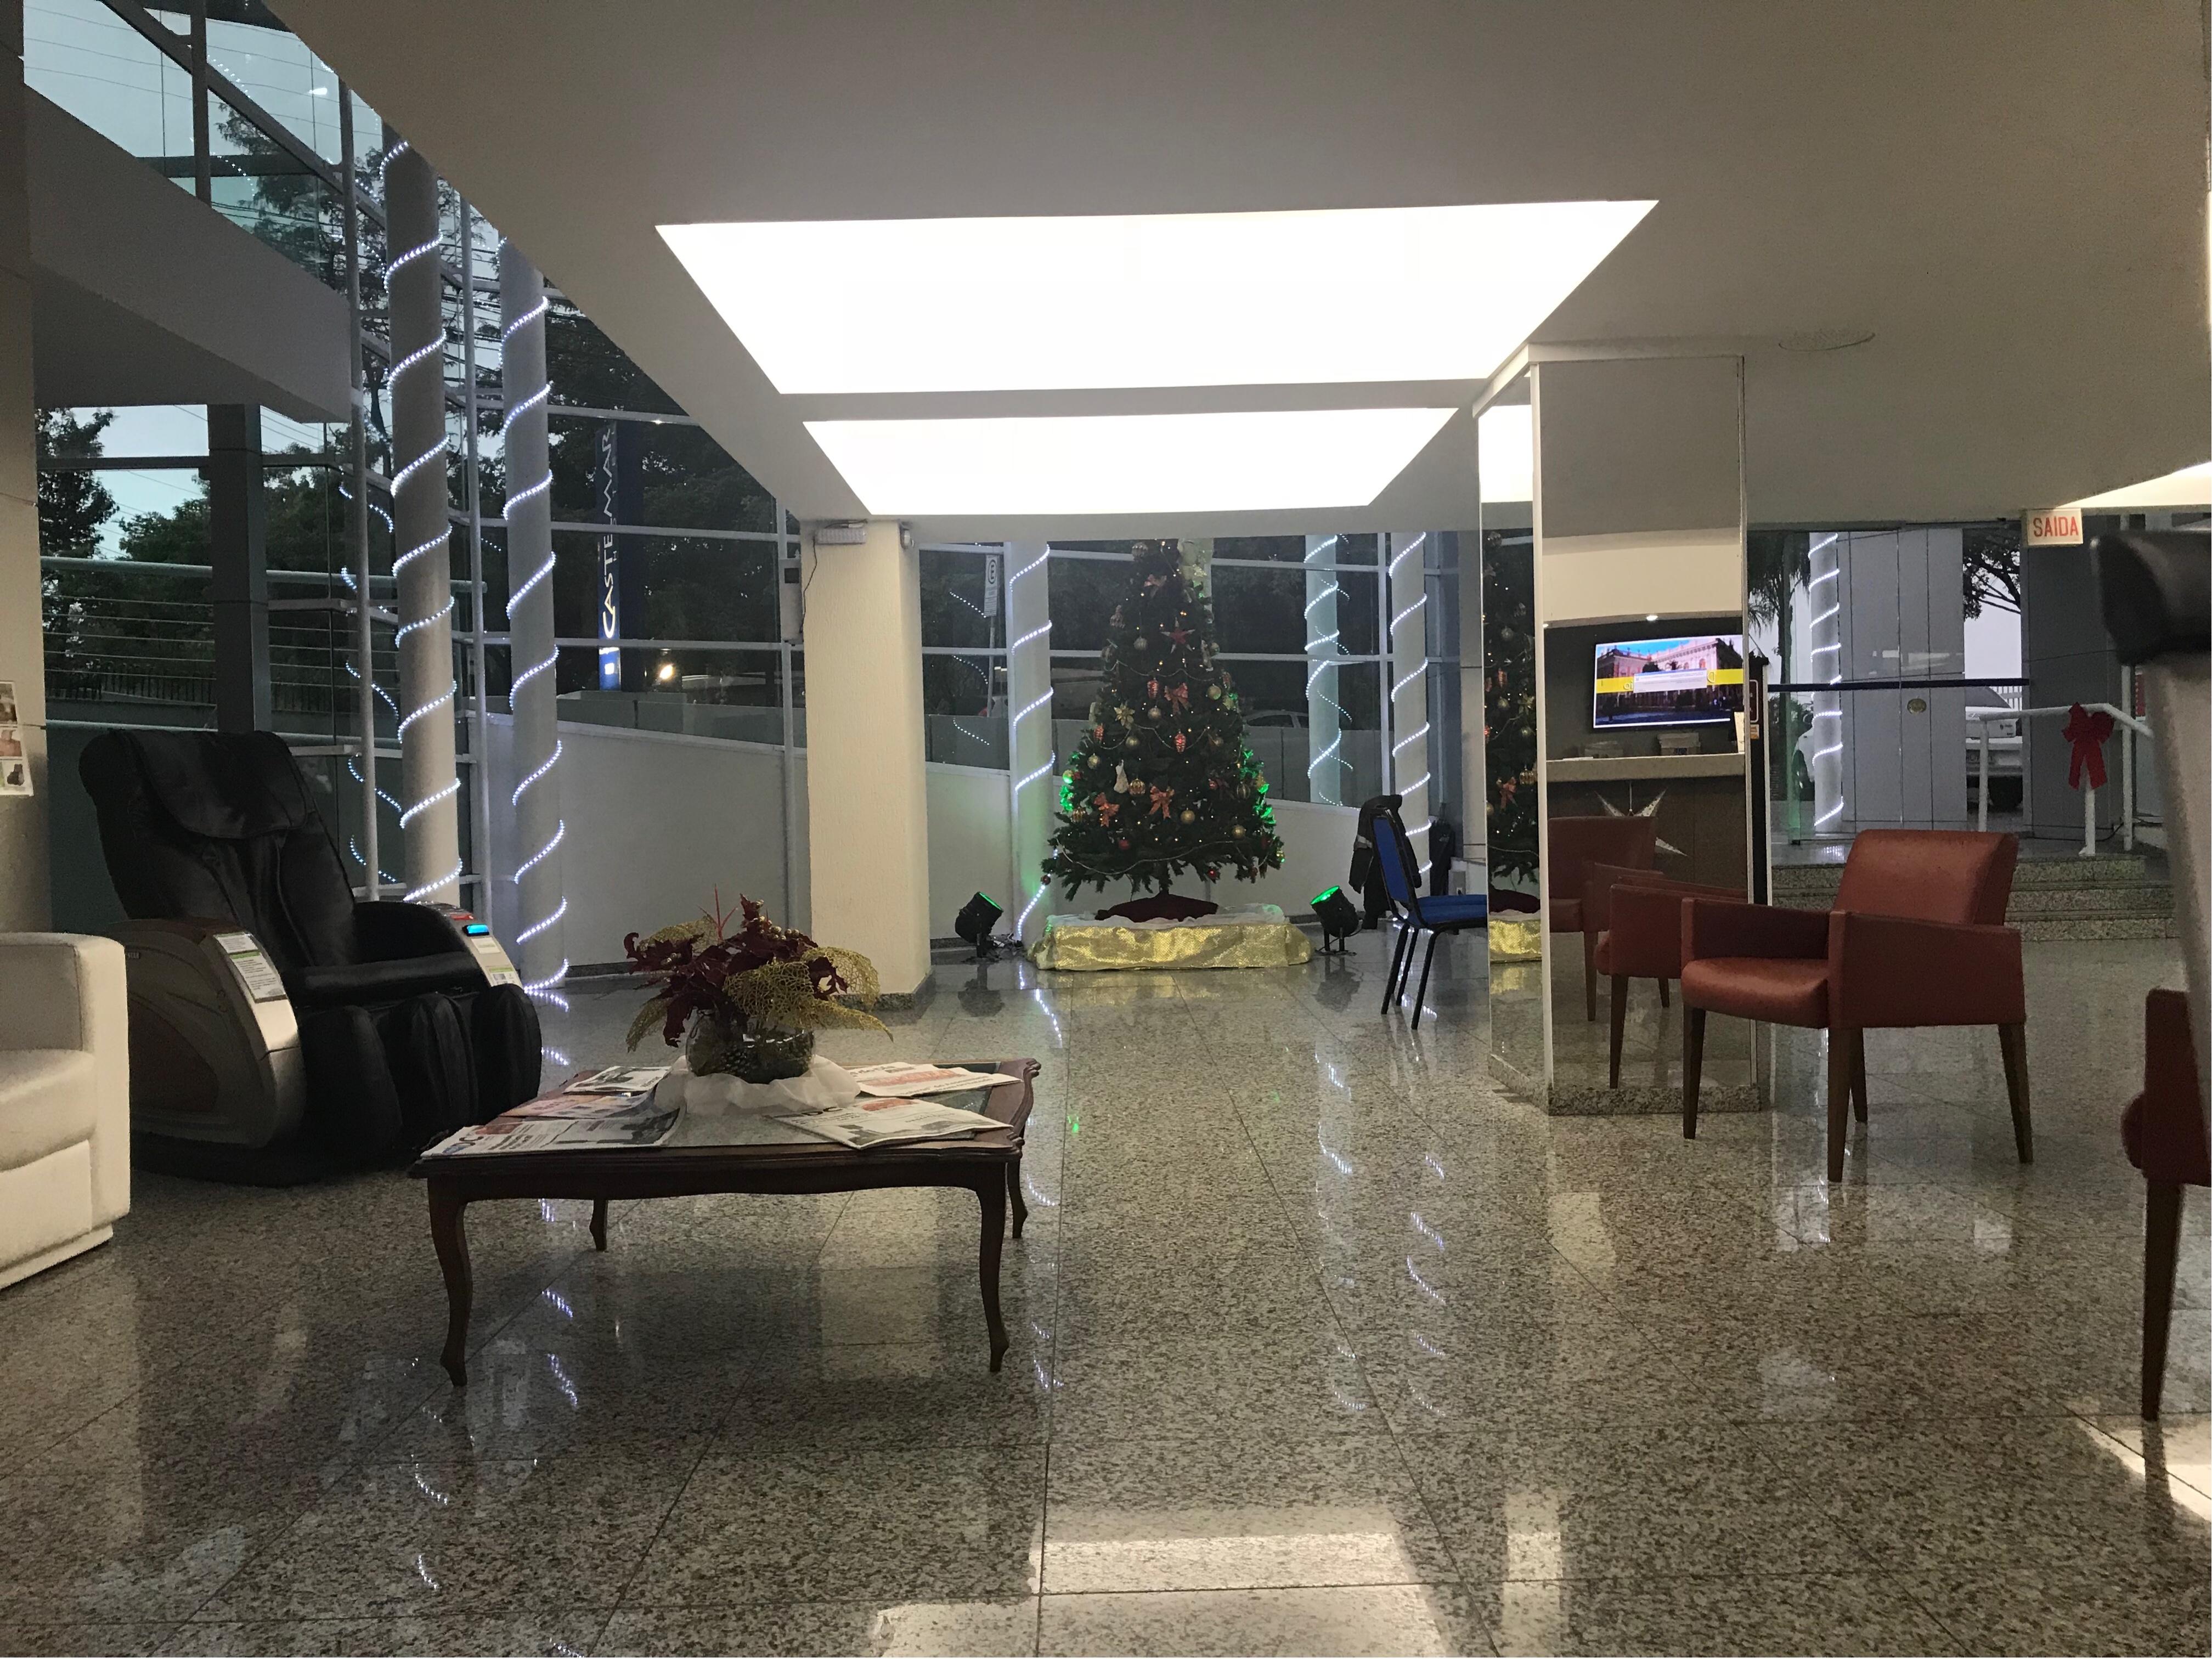 Recepção Hotel CastelMar Florianópolis